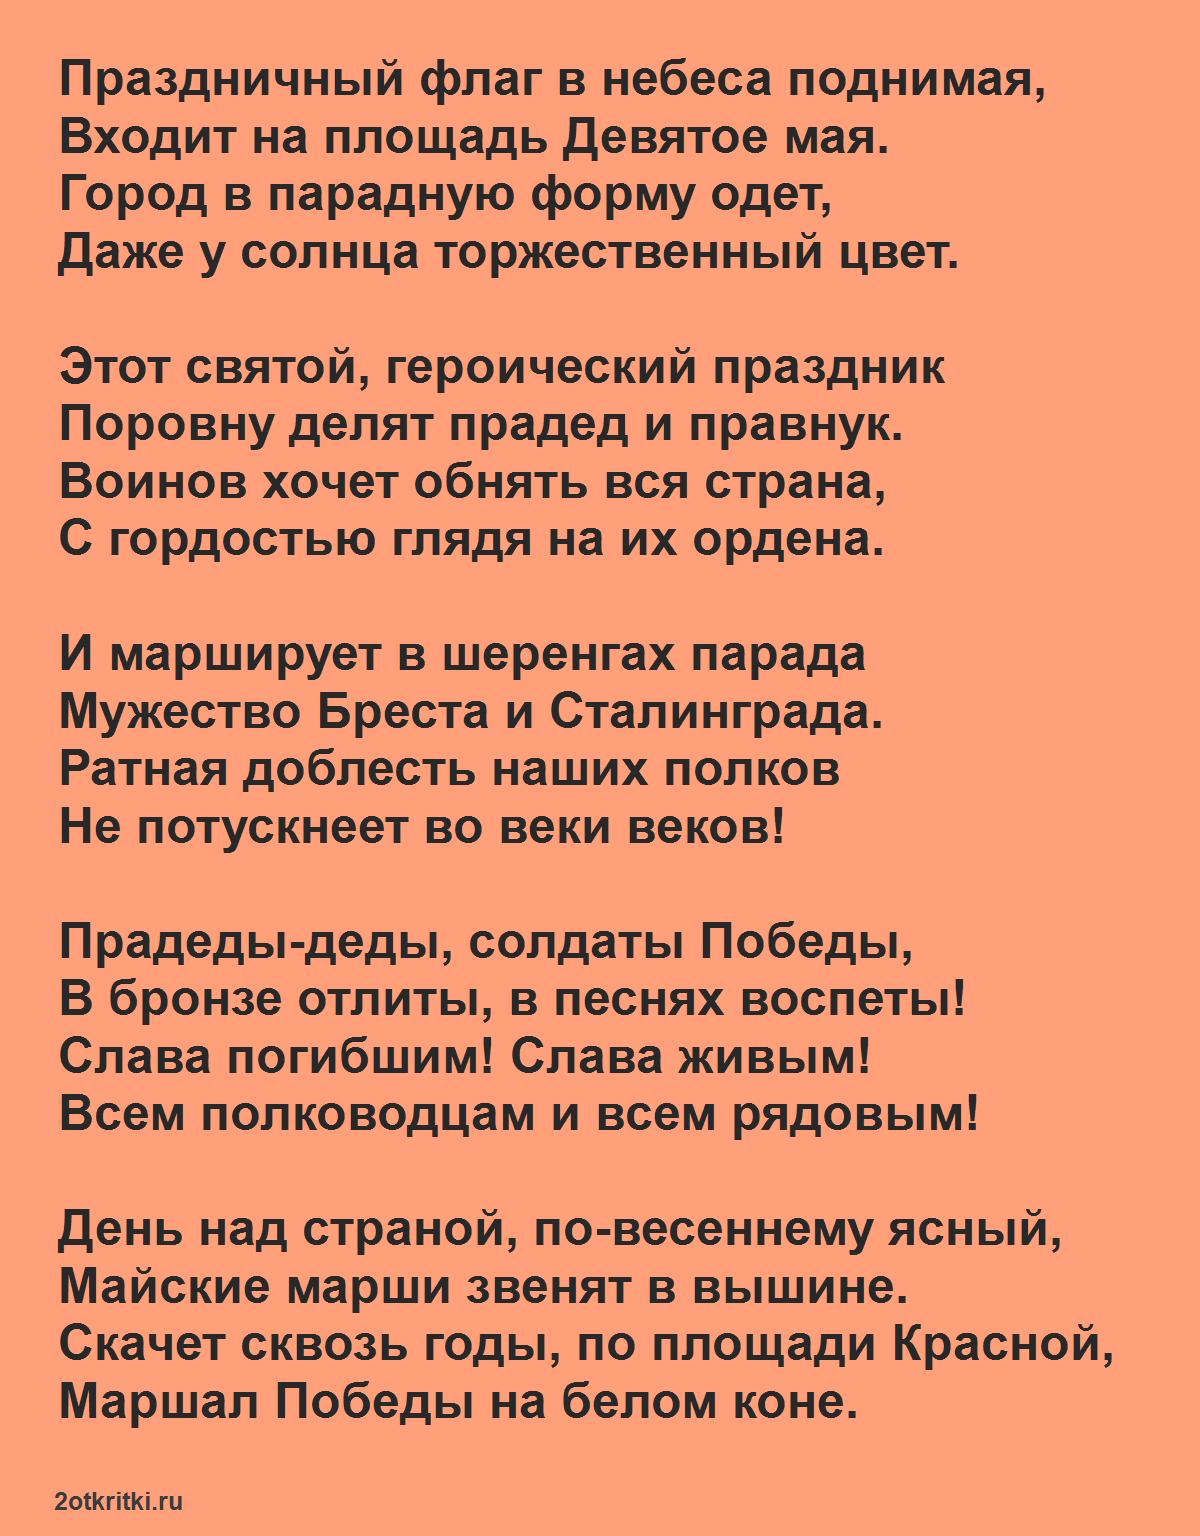 Стих про 9 мая - 9 мая